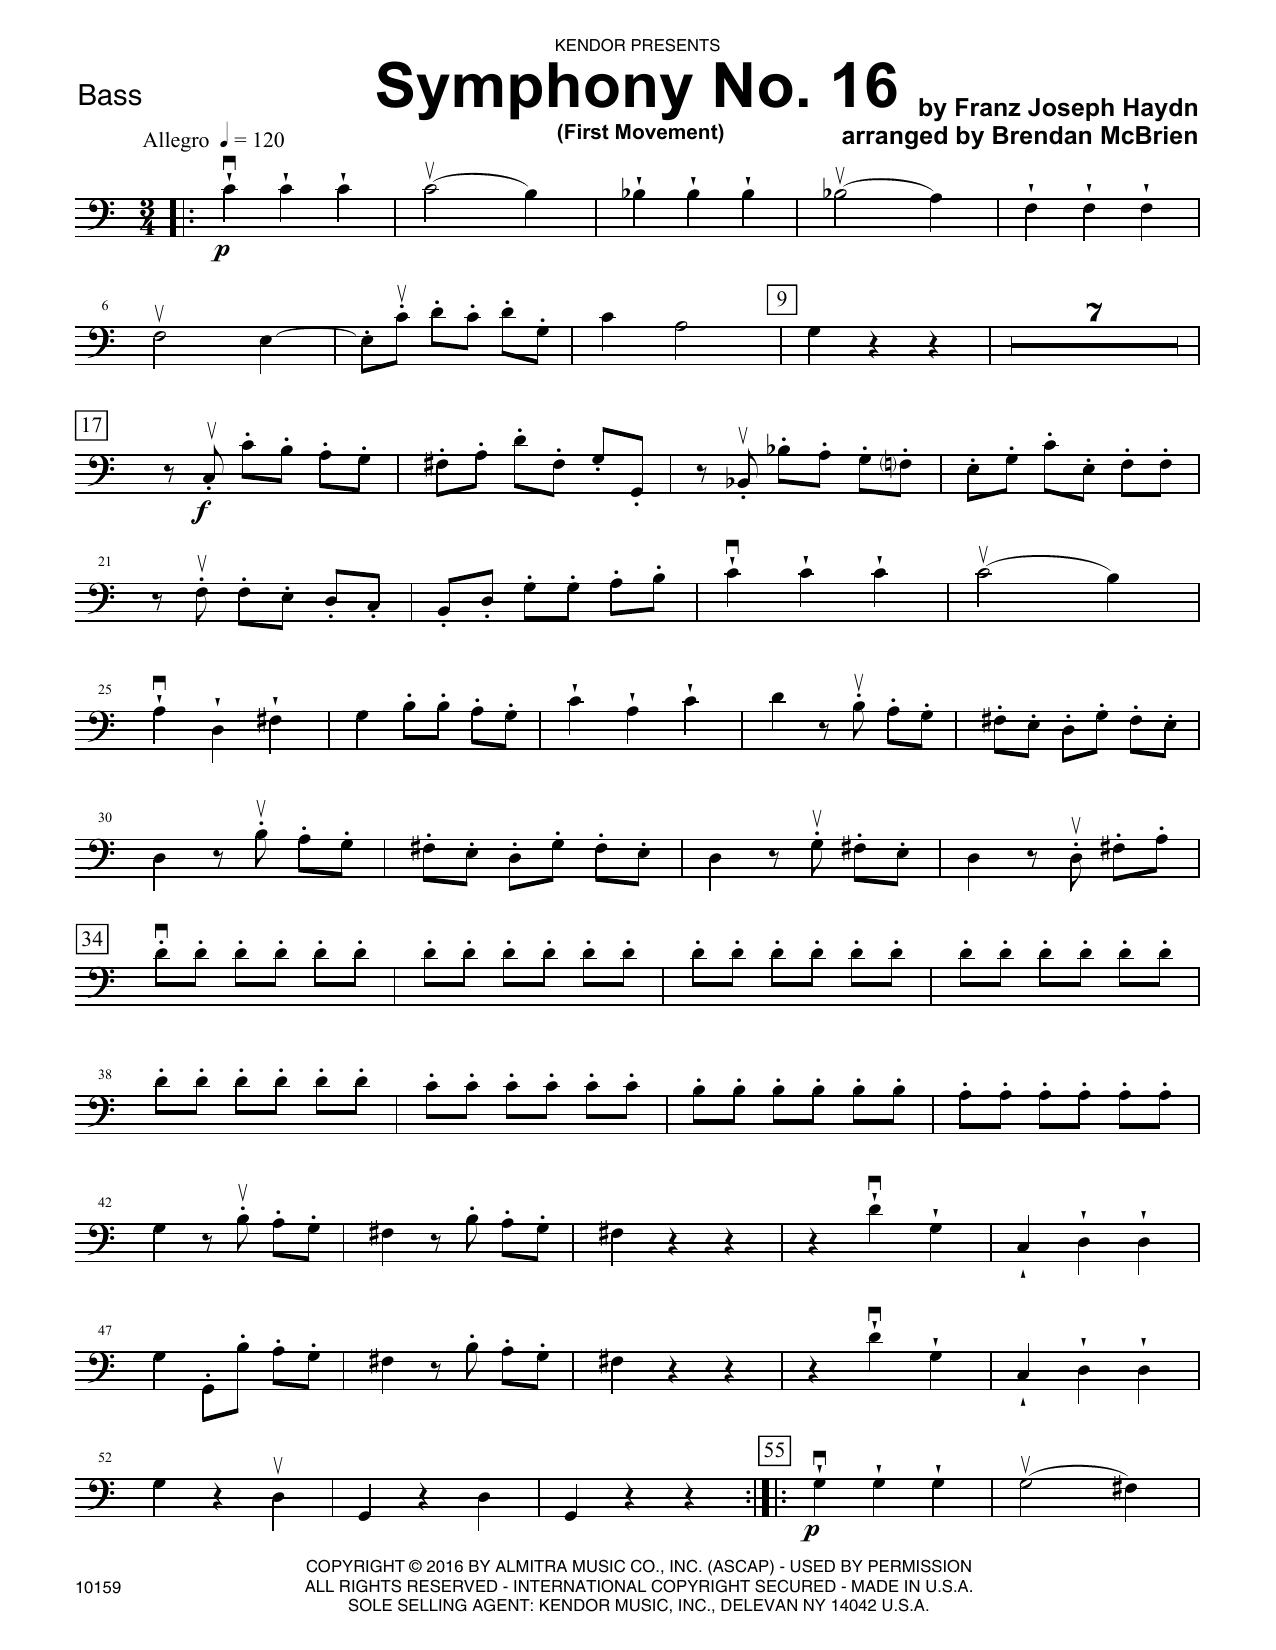 Symphony No. 16 (First Movement) - Bass